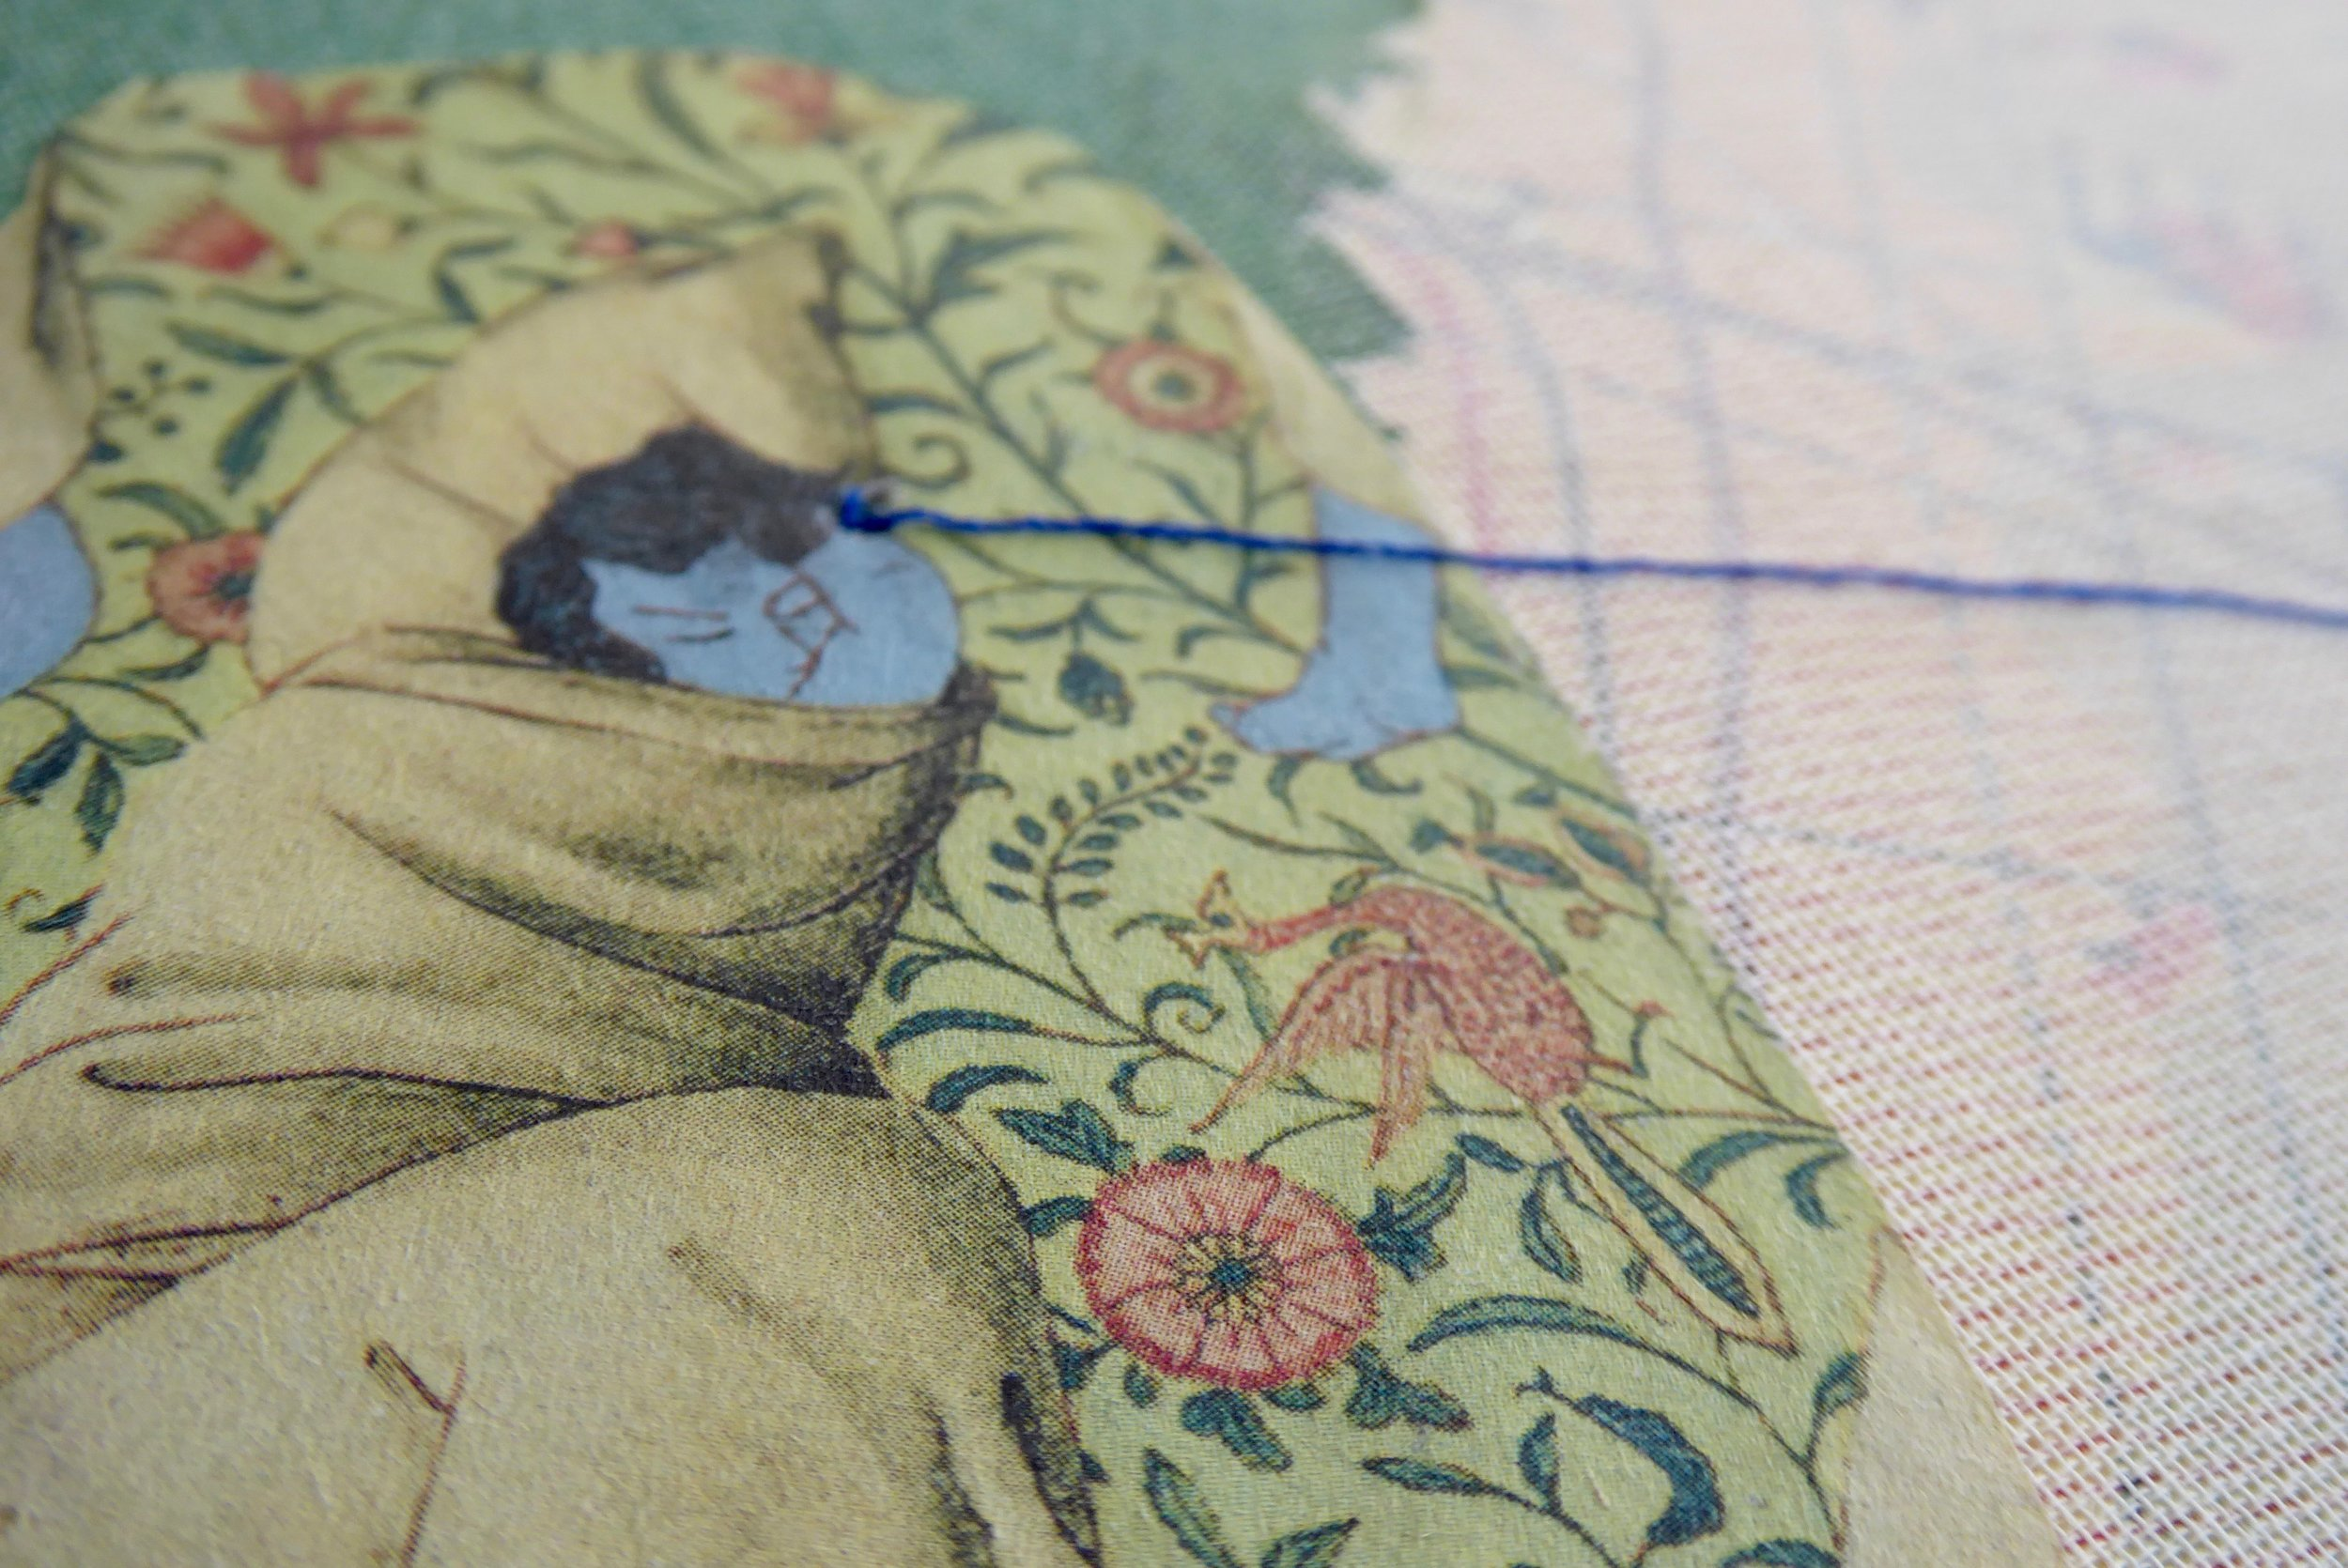 karin_schaefer_collage_art_seamaps_vacansea_detail.jpg